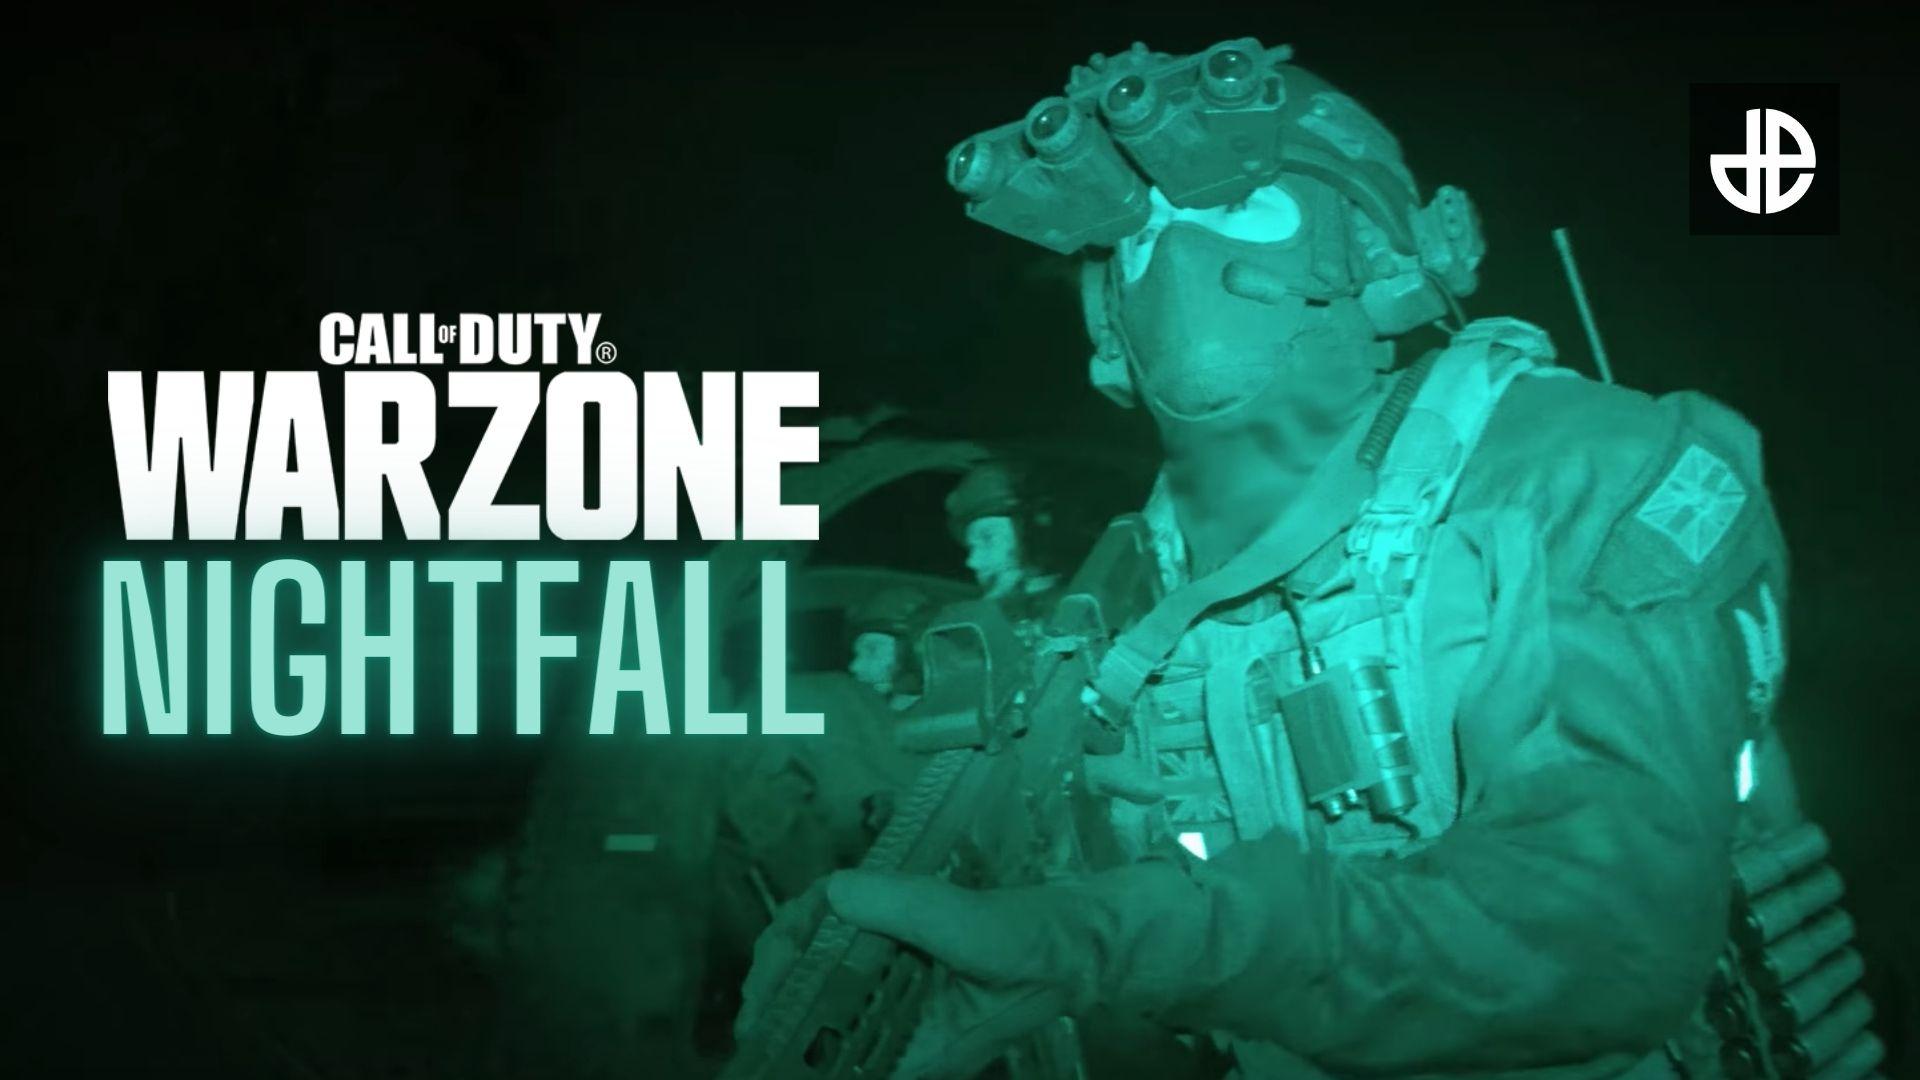 CoD Warzone Nightfall game mode